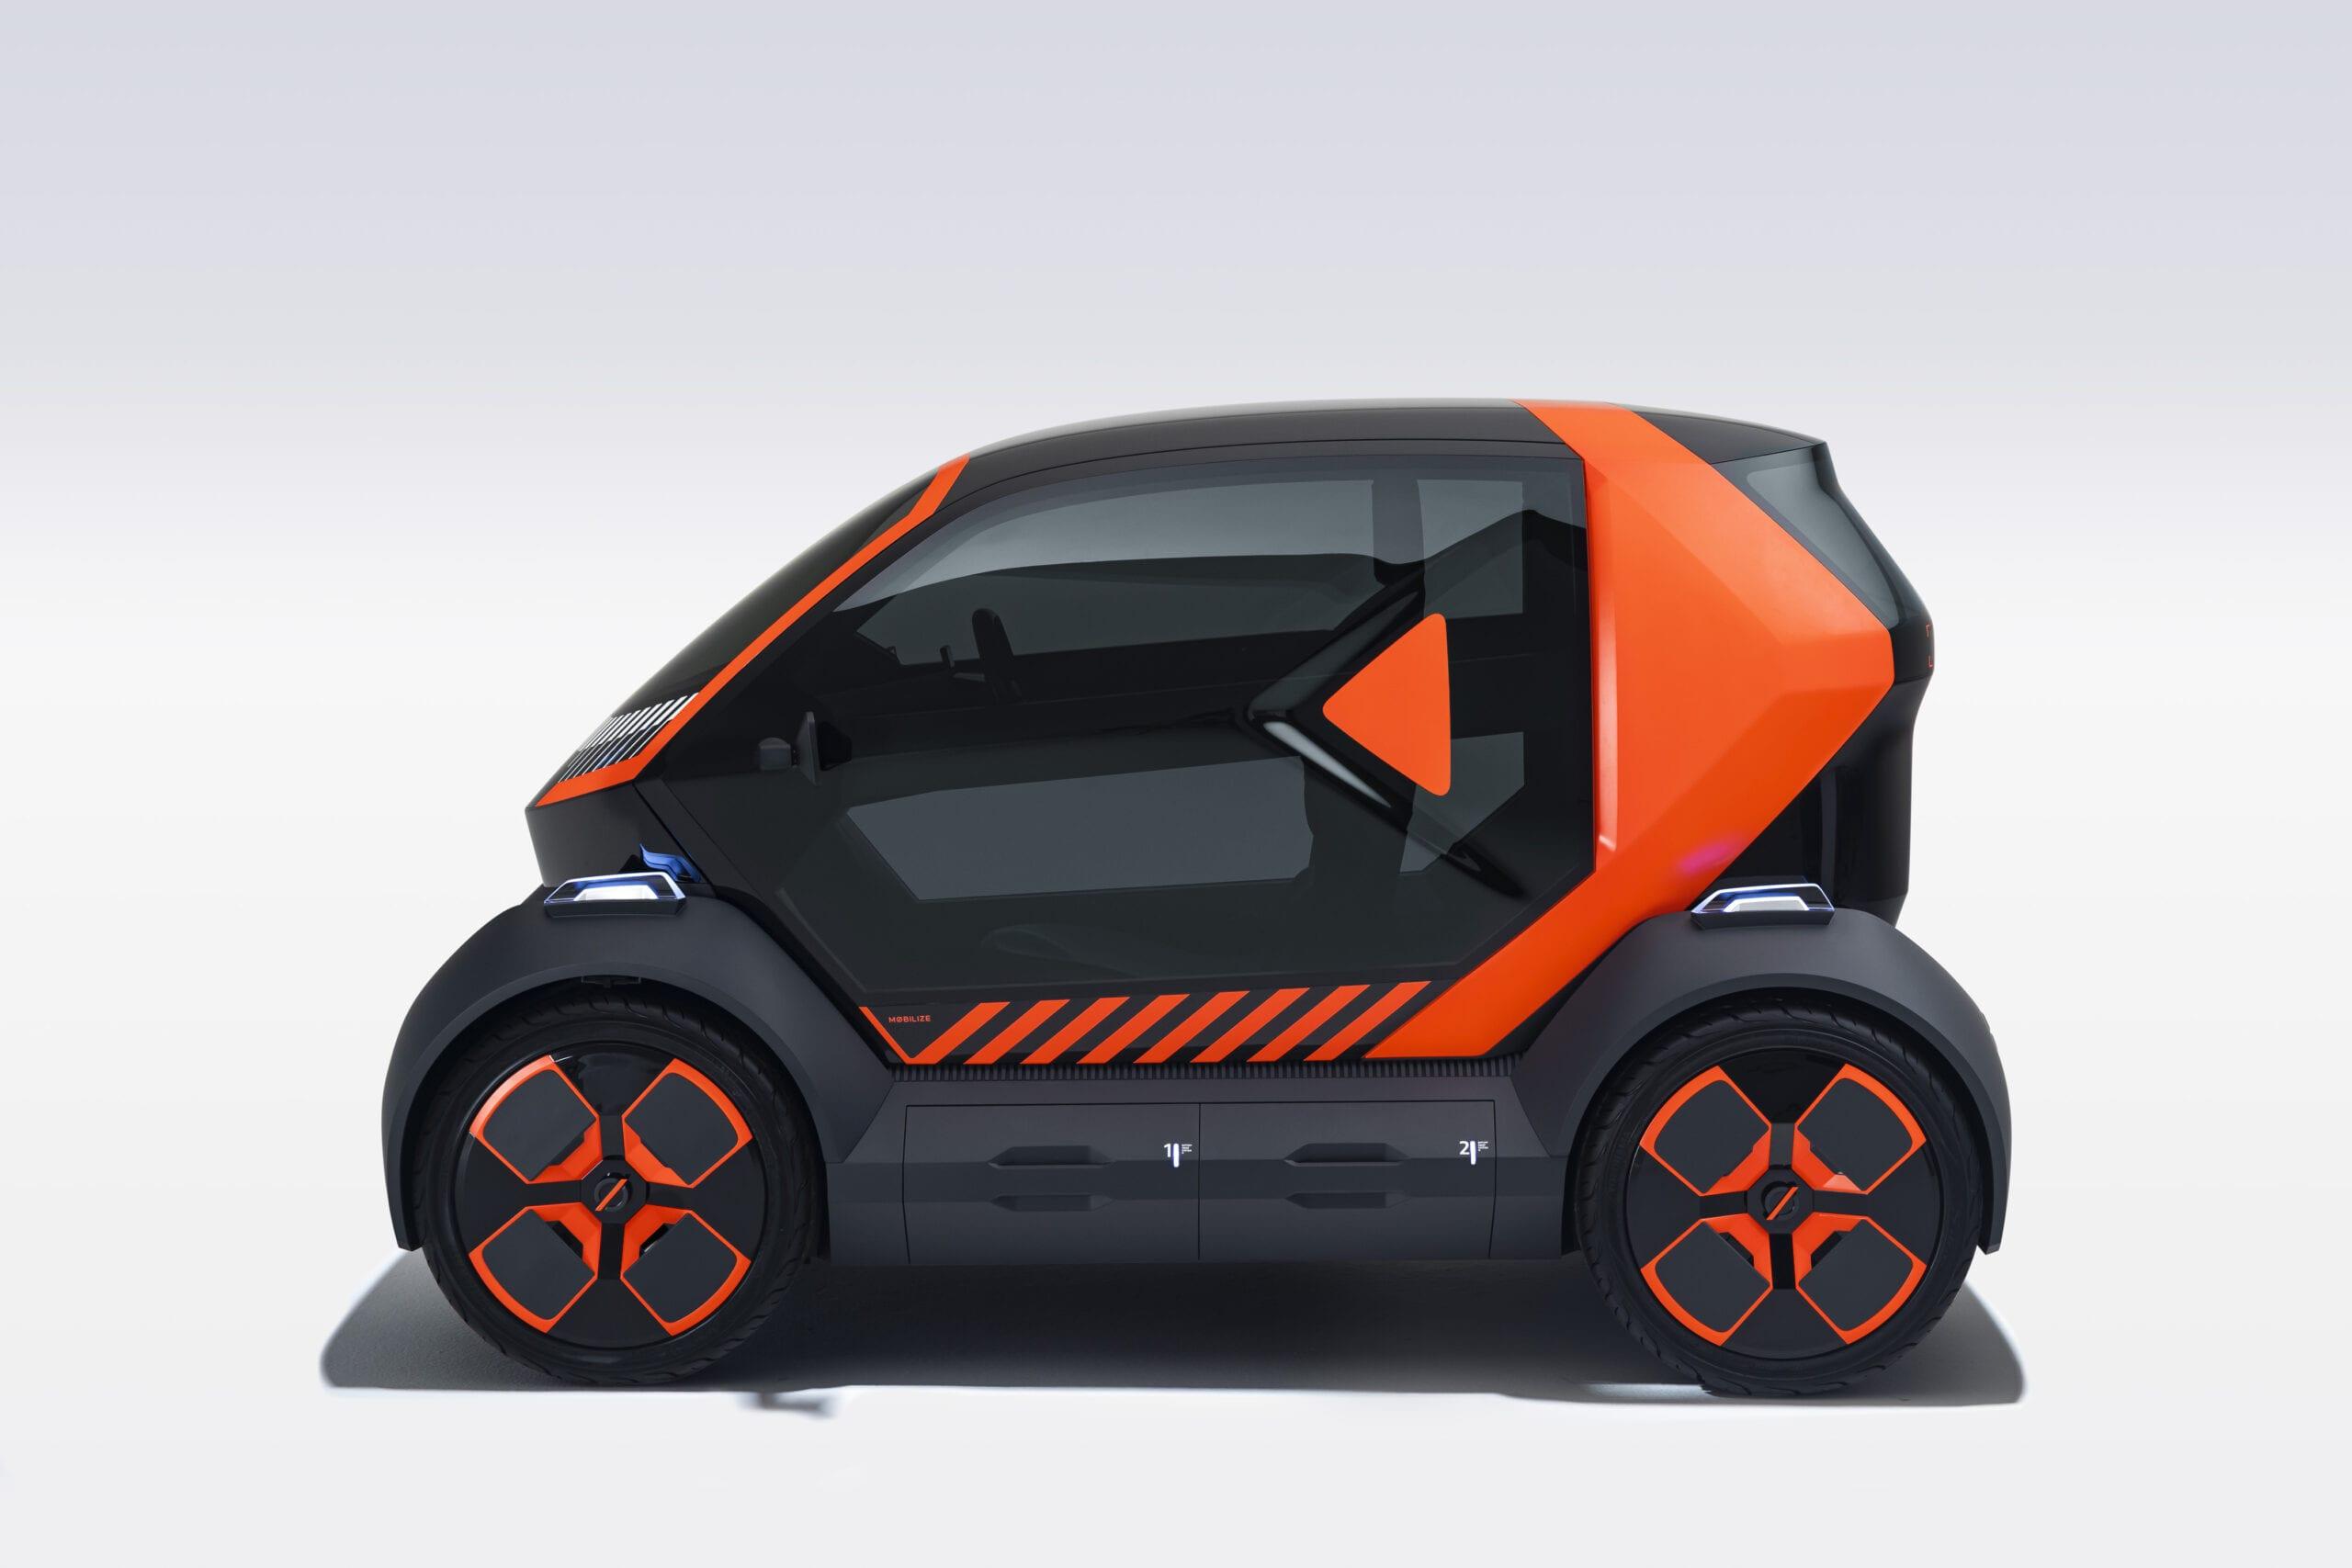 Prototyp EZ-1 Mobilize Renault